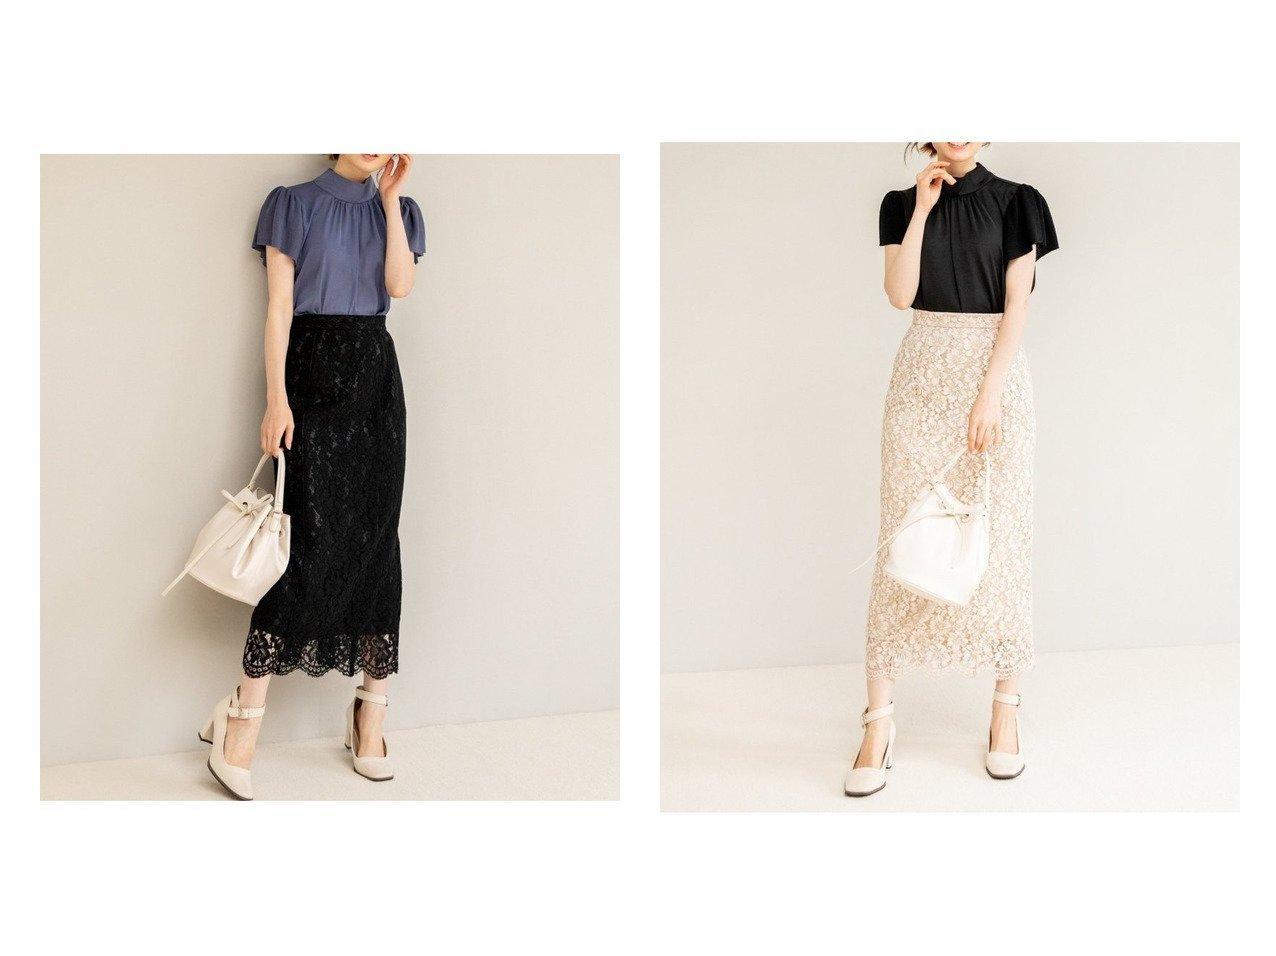 【MISCH MASCH/ミッシュマッシュ】のレースタイトロングスカート おすすめ!人気、トレンド・レディースファッションの通販 おすすめで人気の流行・トレンド、ファッションの通販商品 インテリア・家具・メンズファッション・キッズファッション・レディースファッション・服の通販 founy(ファニー) https://founy.com/ ファッション Fashion レディースファッション WOMEN スカート Skirt ロングスカート Long Skirt S/S・春夏 SS・Spring/Summer おすすめ Recommend タイトスカート レース 人気 夏 Summer 春 Spring |ID:crp329100000061087